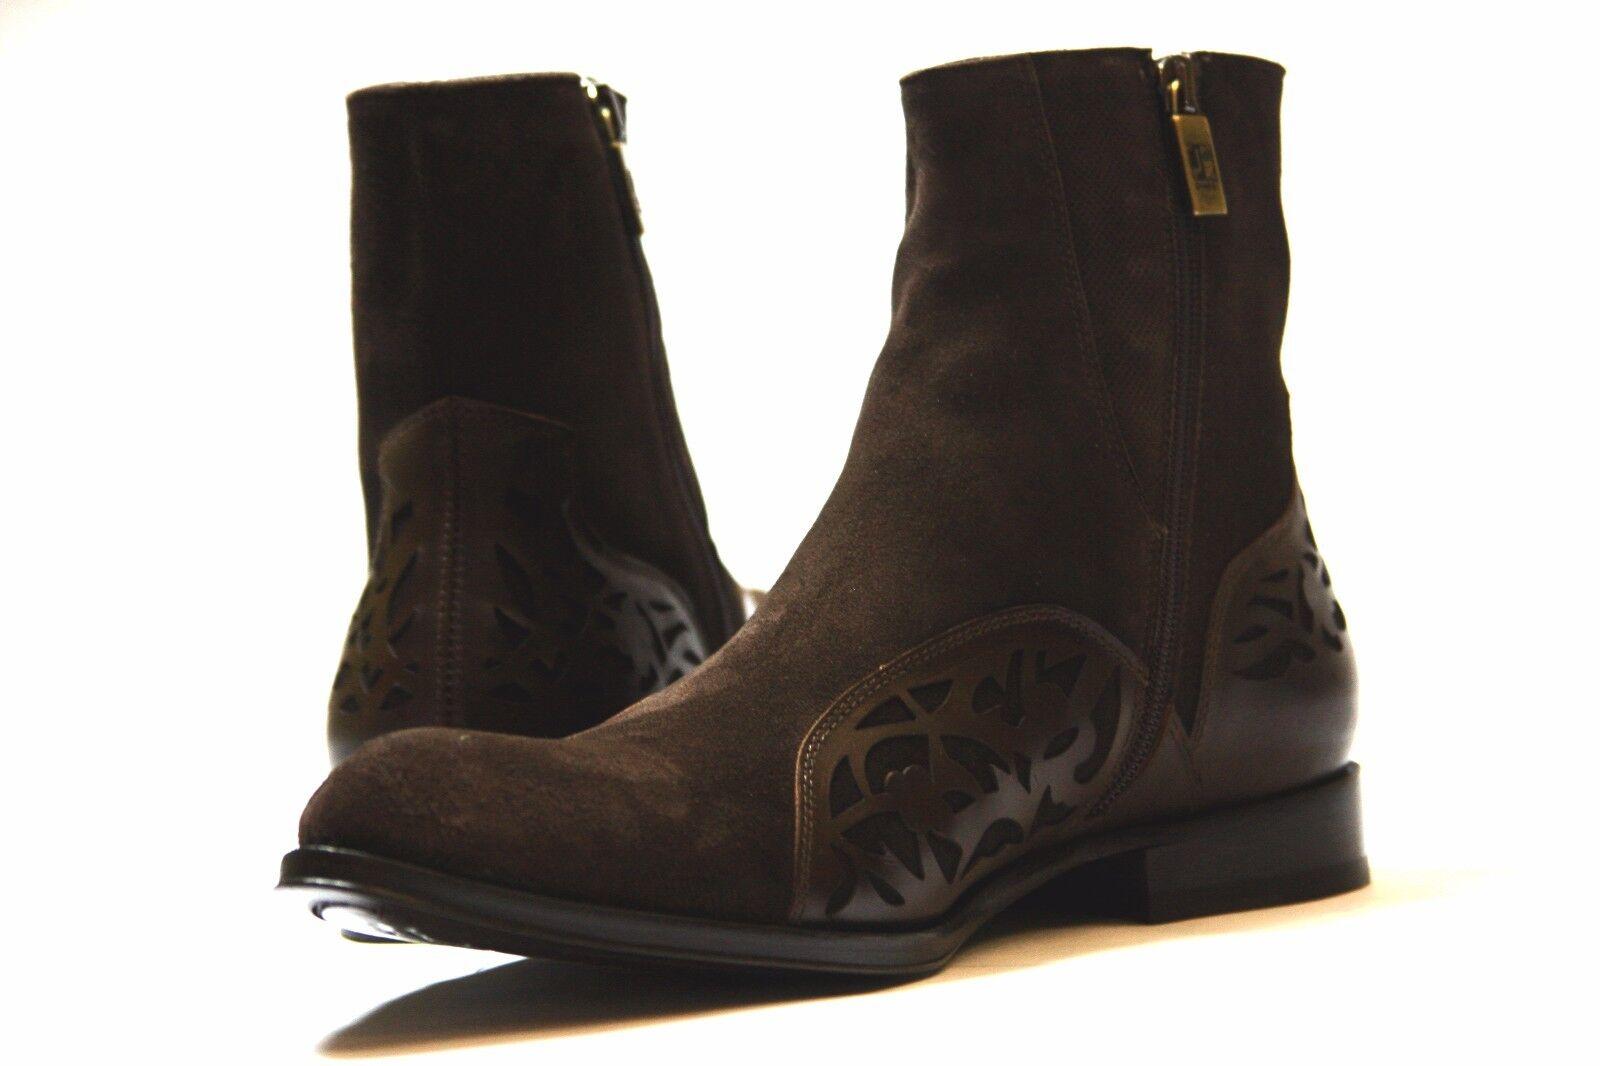 Jo Ghost 3550M Uomo Italian Brown Suede Suede Suede with Decorative Pelle Ankle Stivali edb7c5